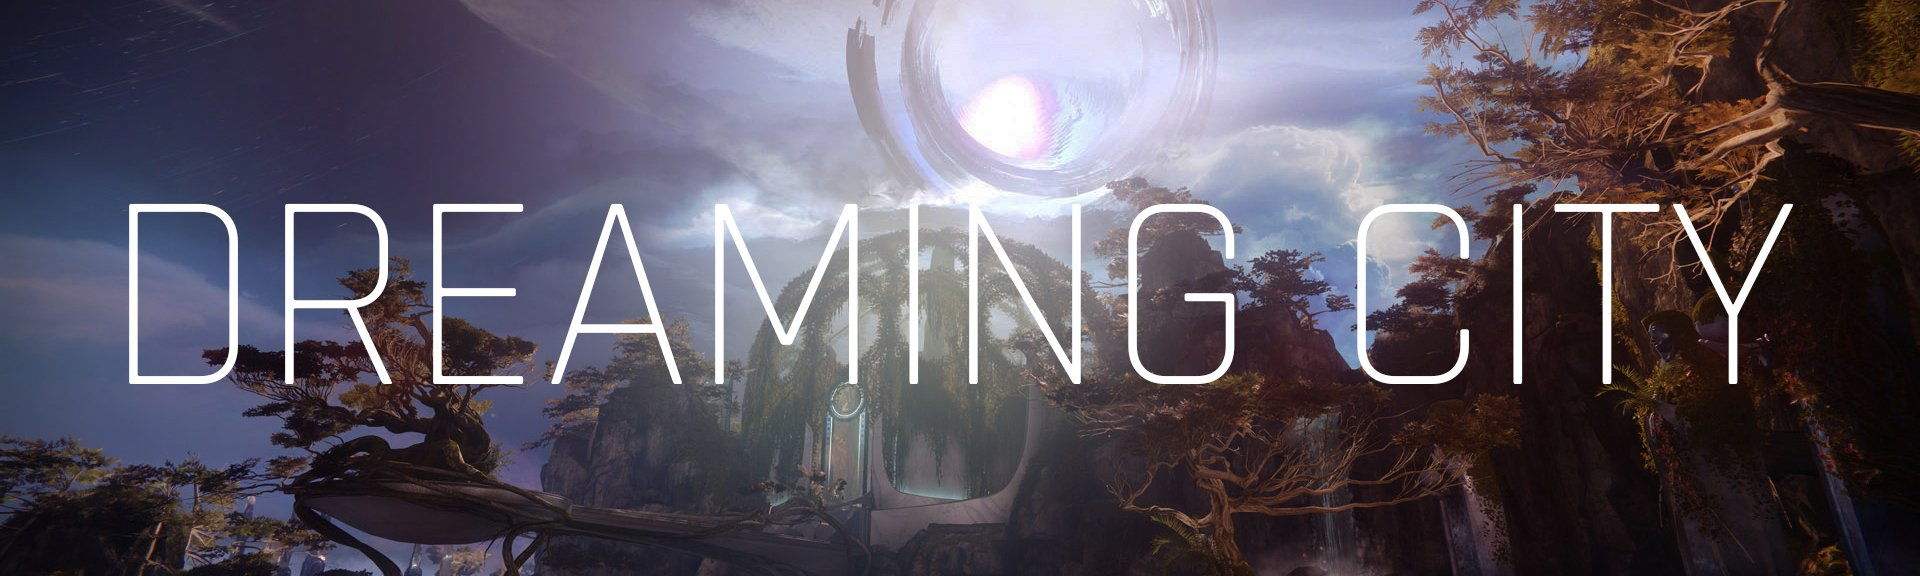 destiny-2-dreaming-city-header-font.jpg